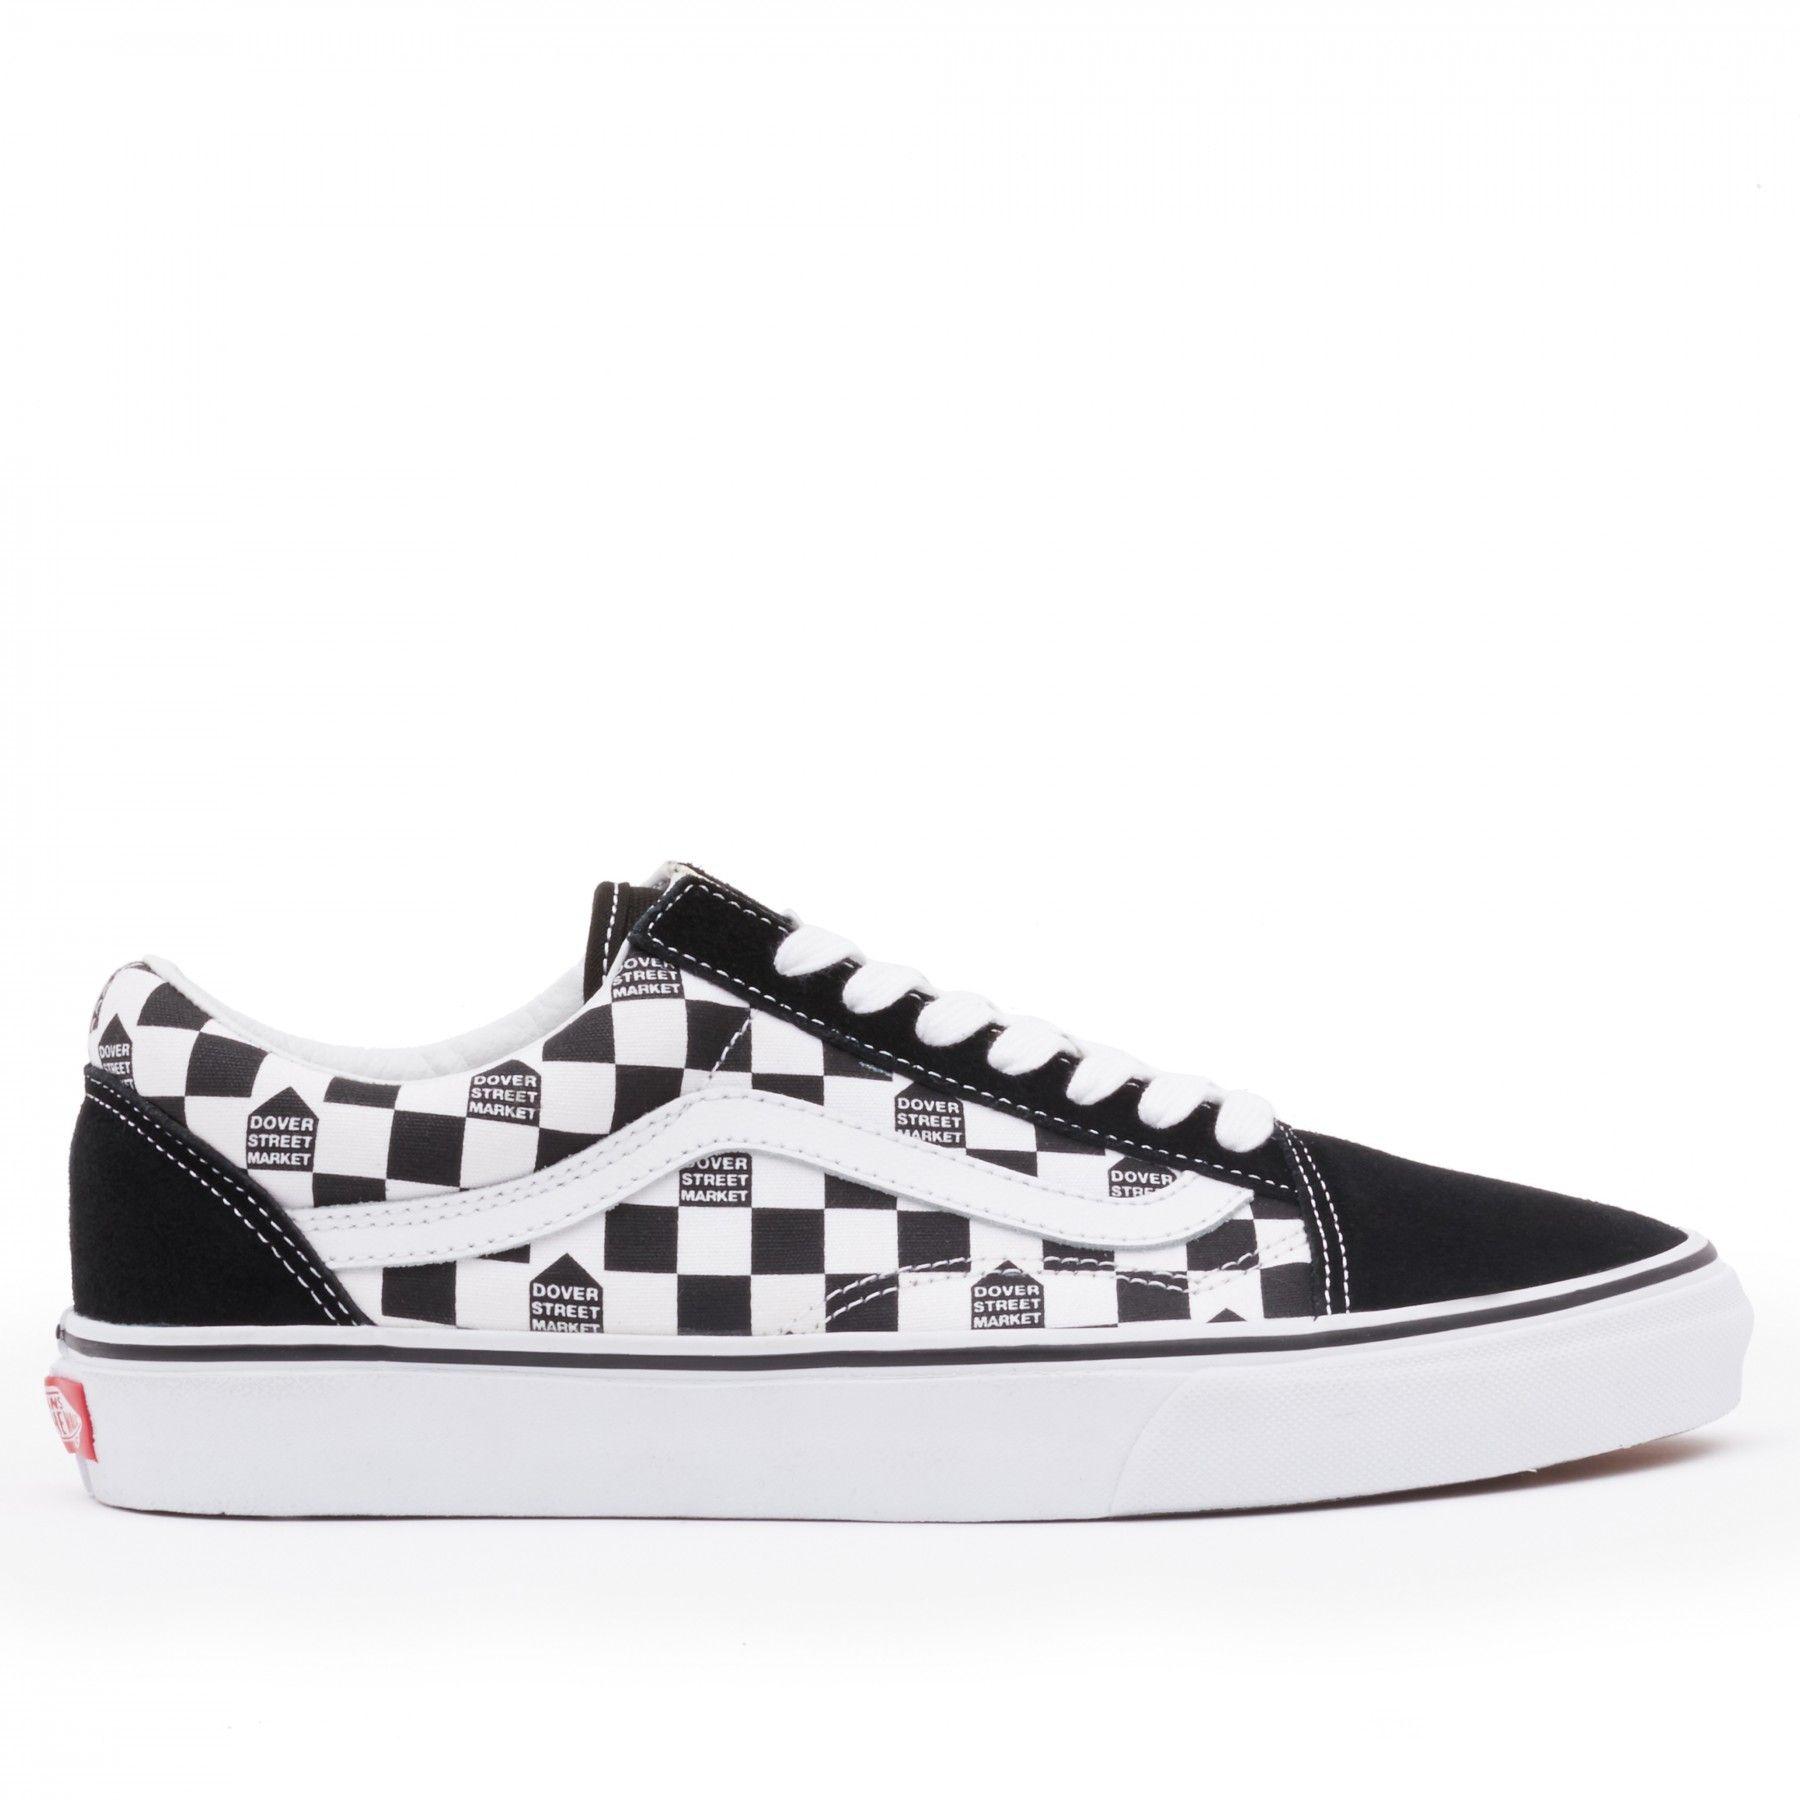 Vans x DSM Old Skool (VN0004OJJ7L) | Vans, Sneaker space